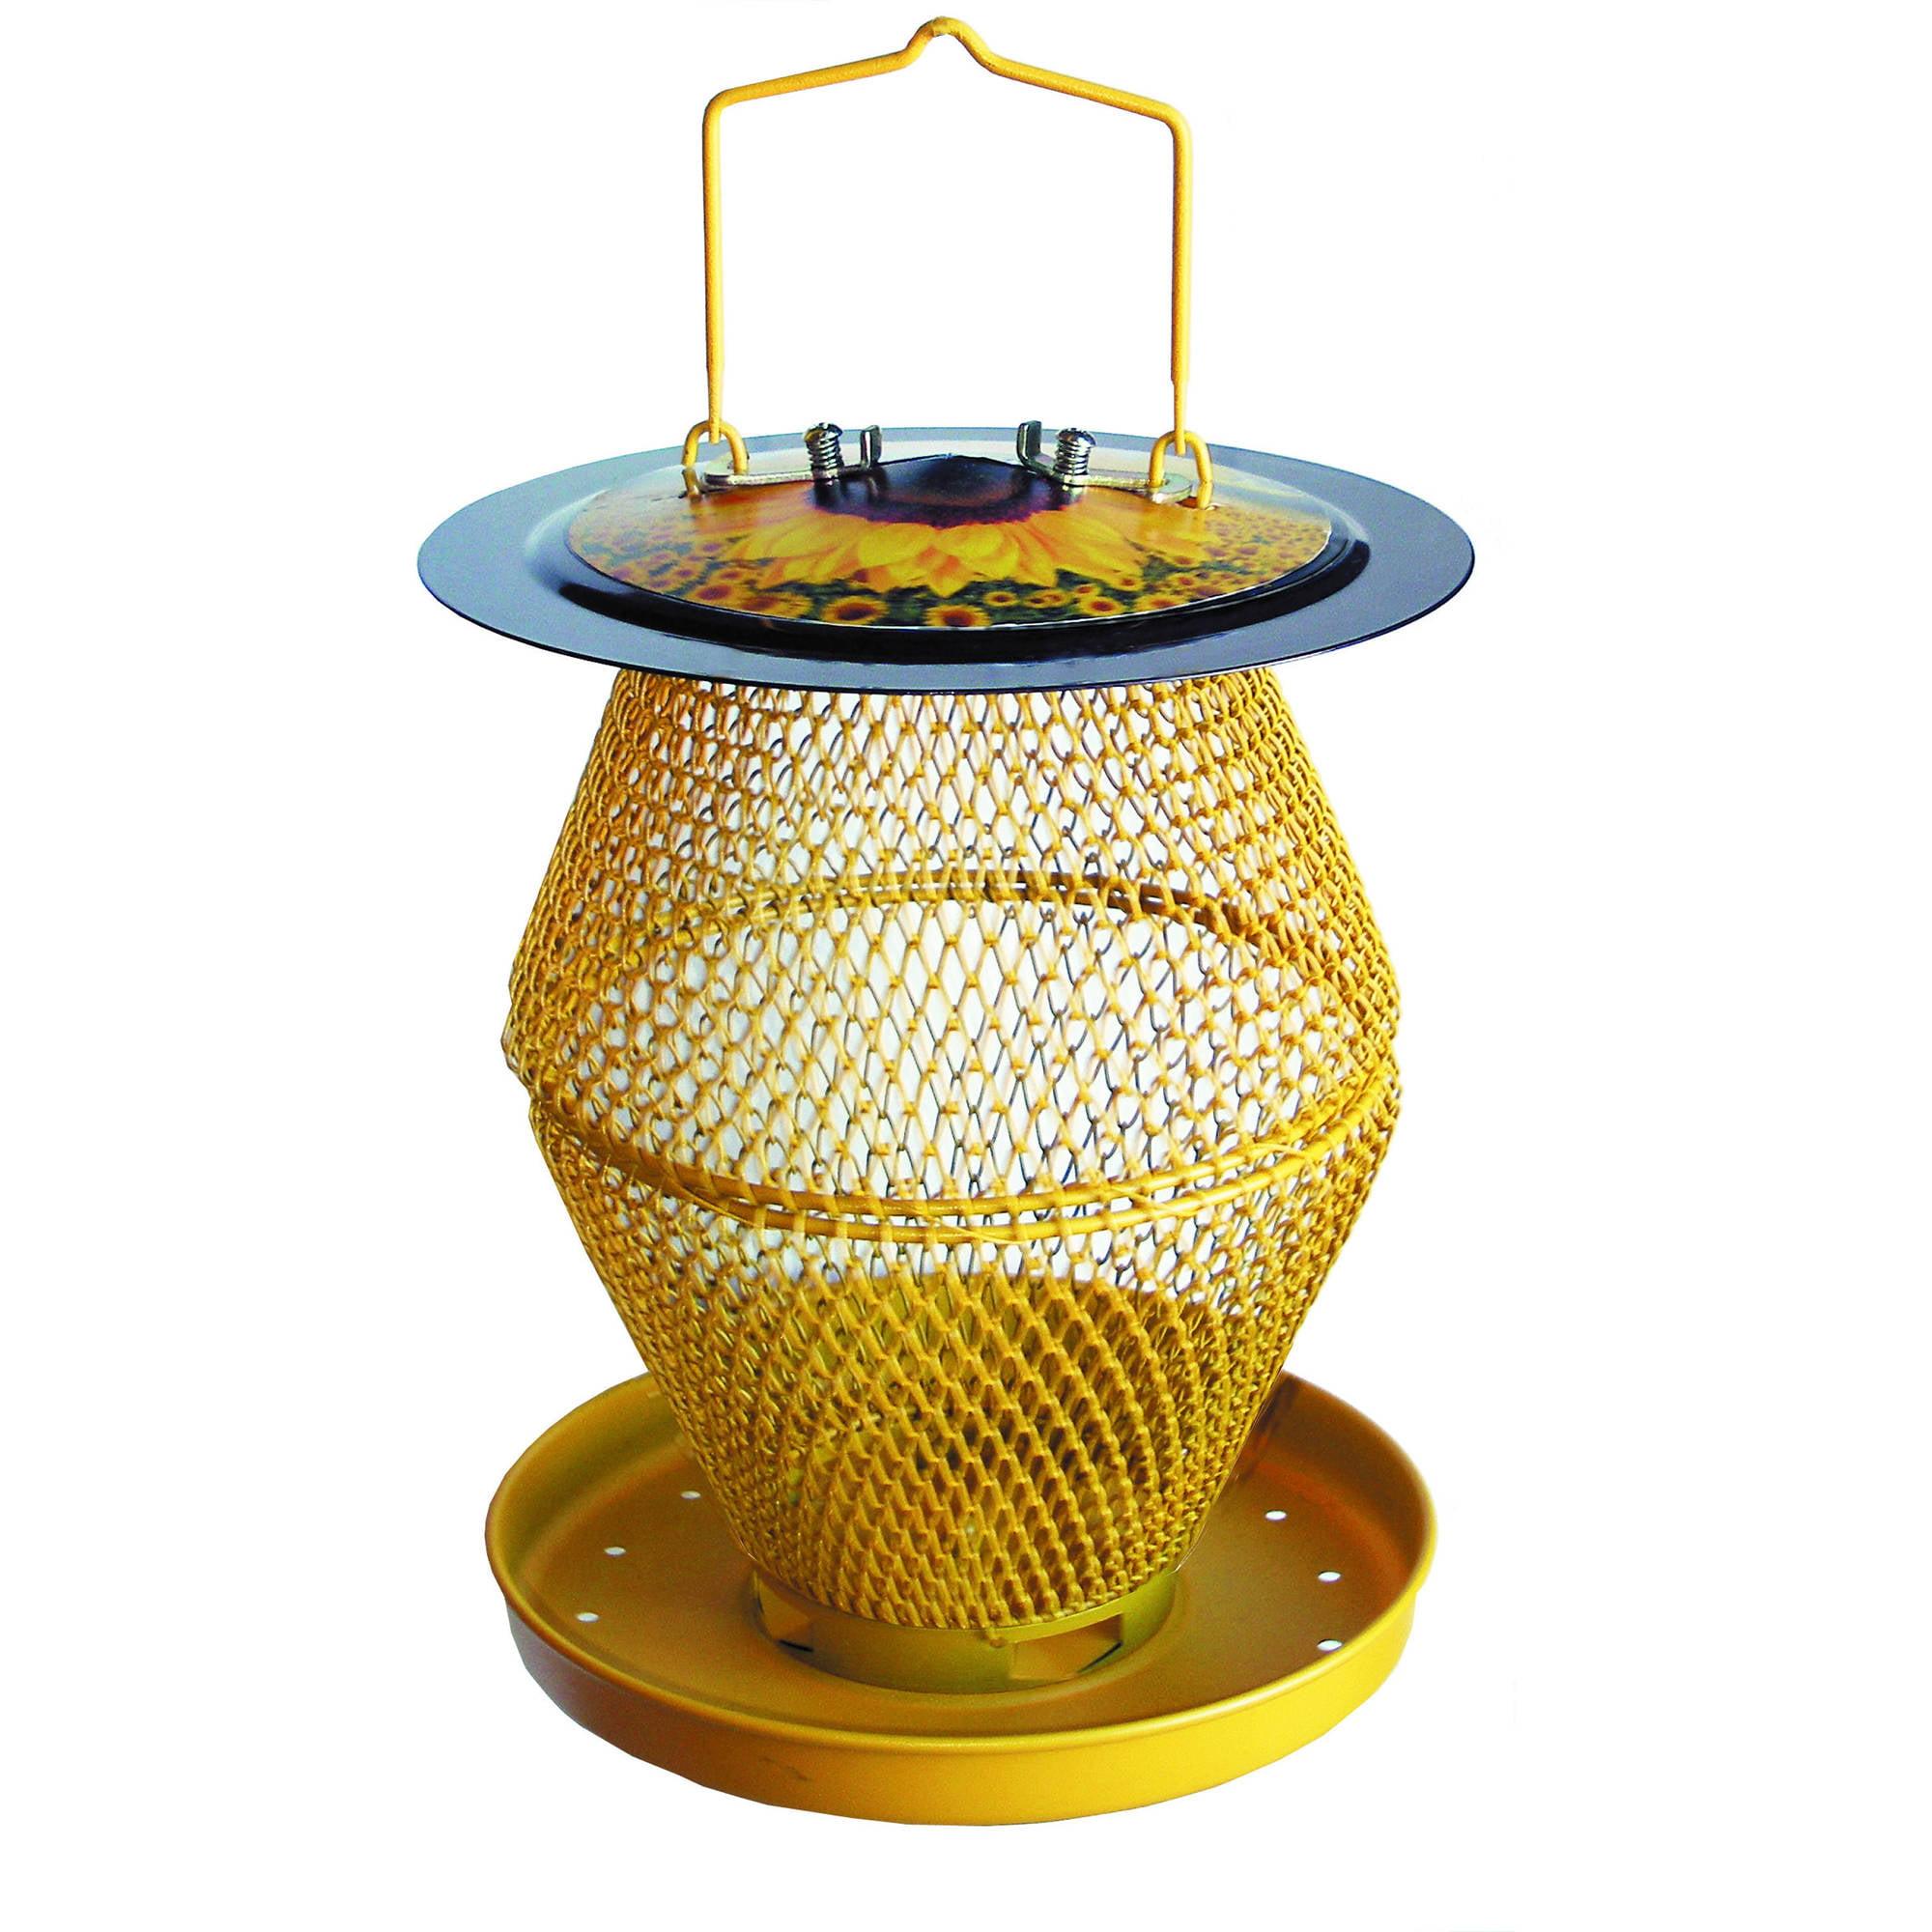 NO NO Designer Sunflower 2-Tier Birdfeeder with Seed Tray by Perky-Pet